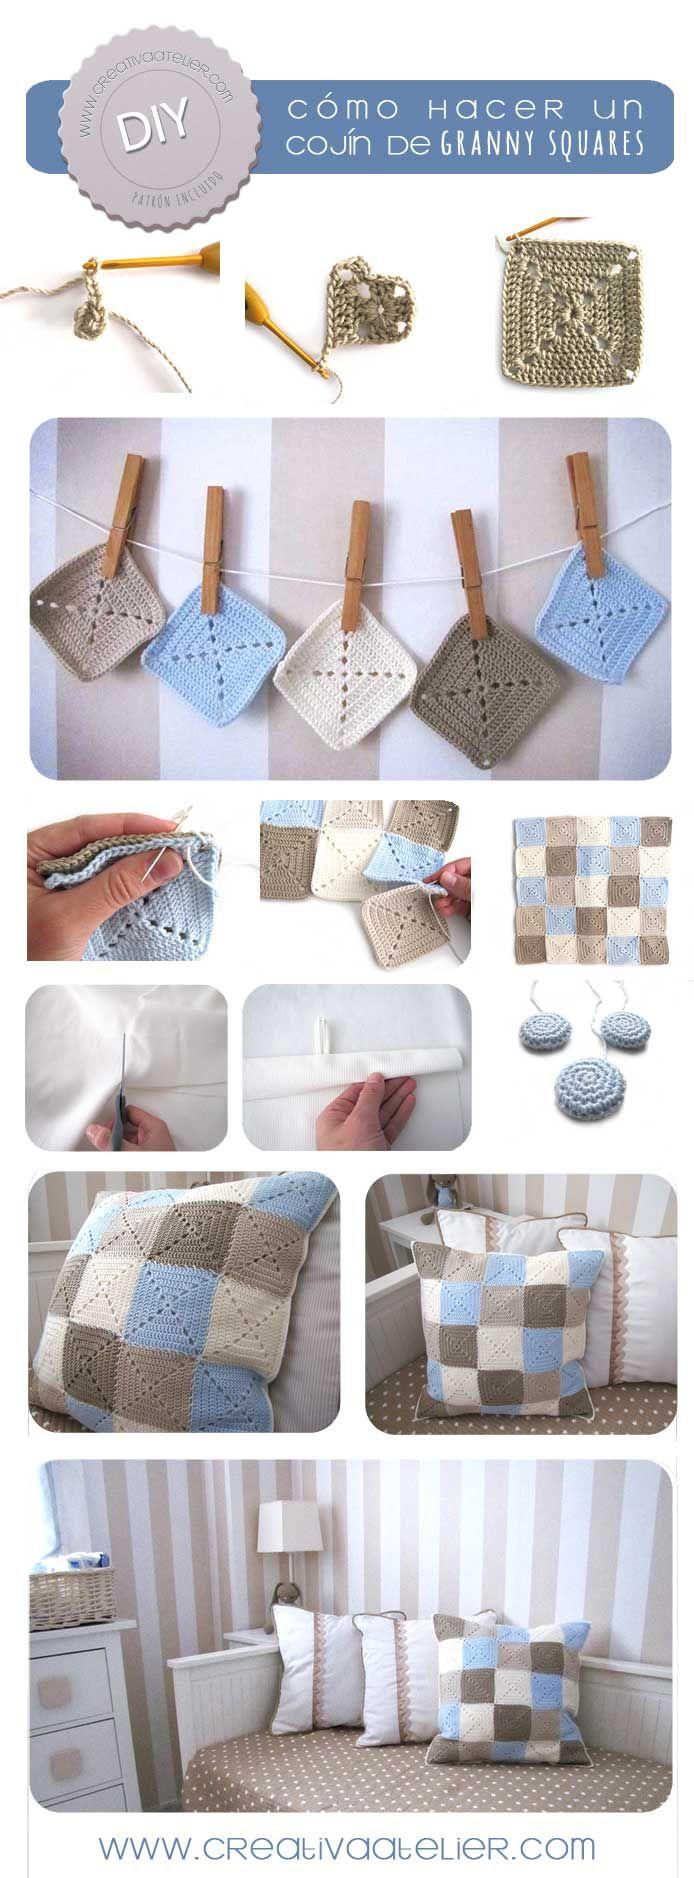 Tutorial para hacer un cojín de Granny Squares #crochet #DIY #grannysquare